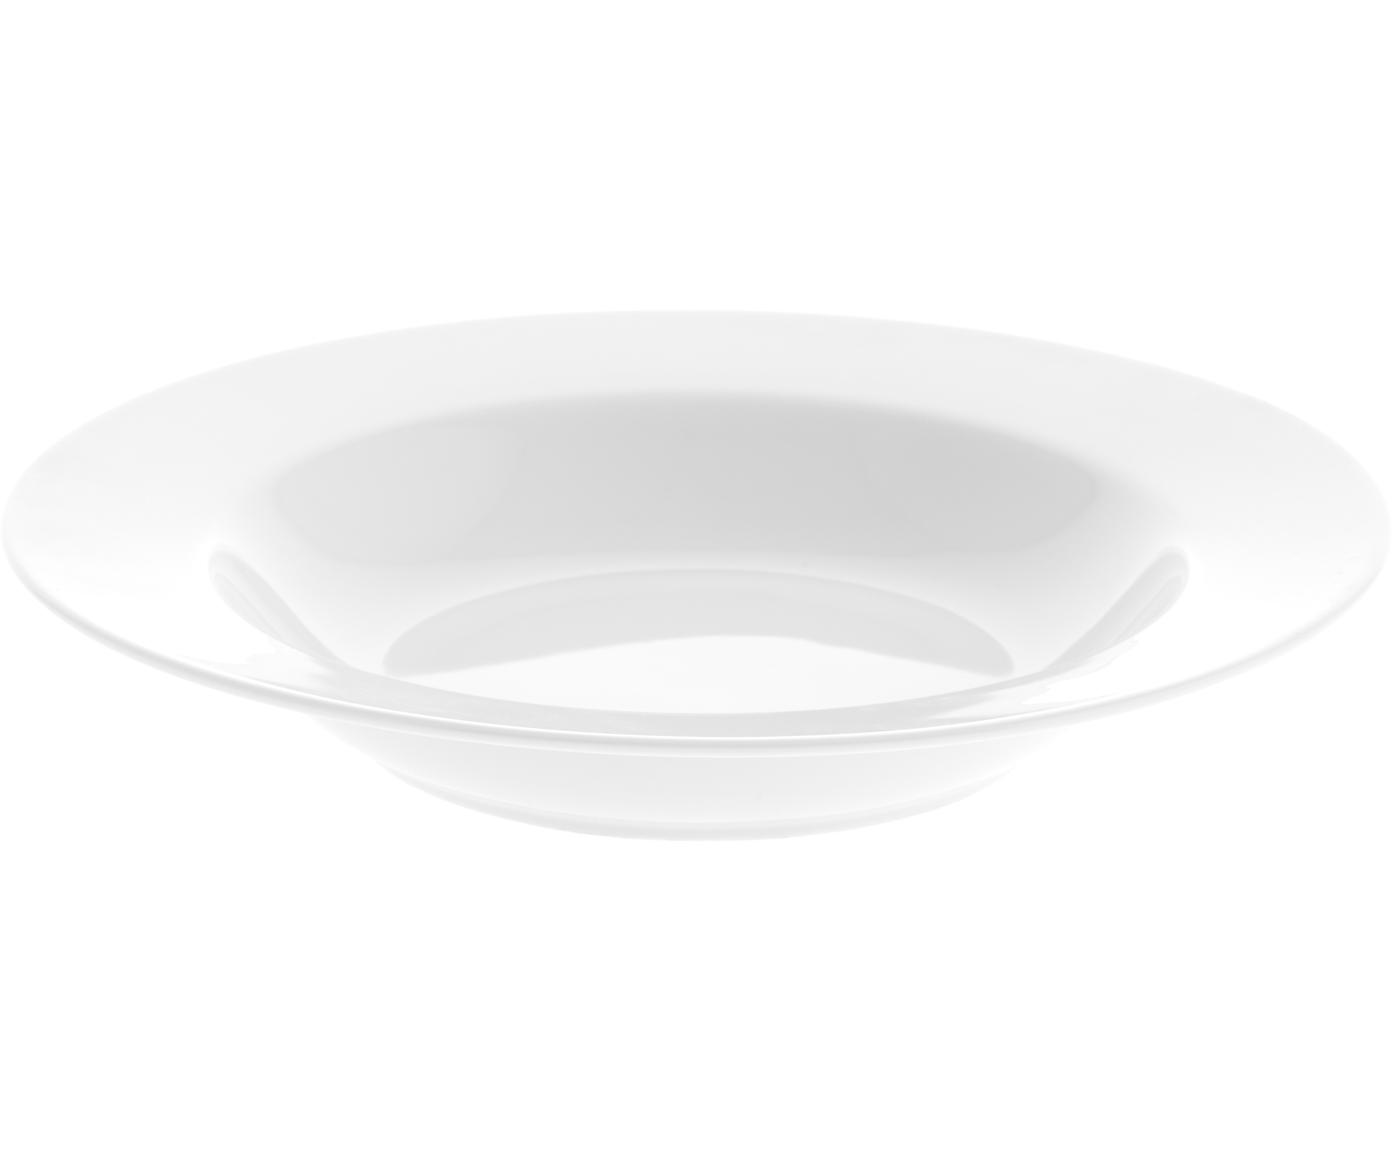 Platos hondos Delight Classic, 2uds., Porcelana, Blanco, Ø 23 x Al 4 cm